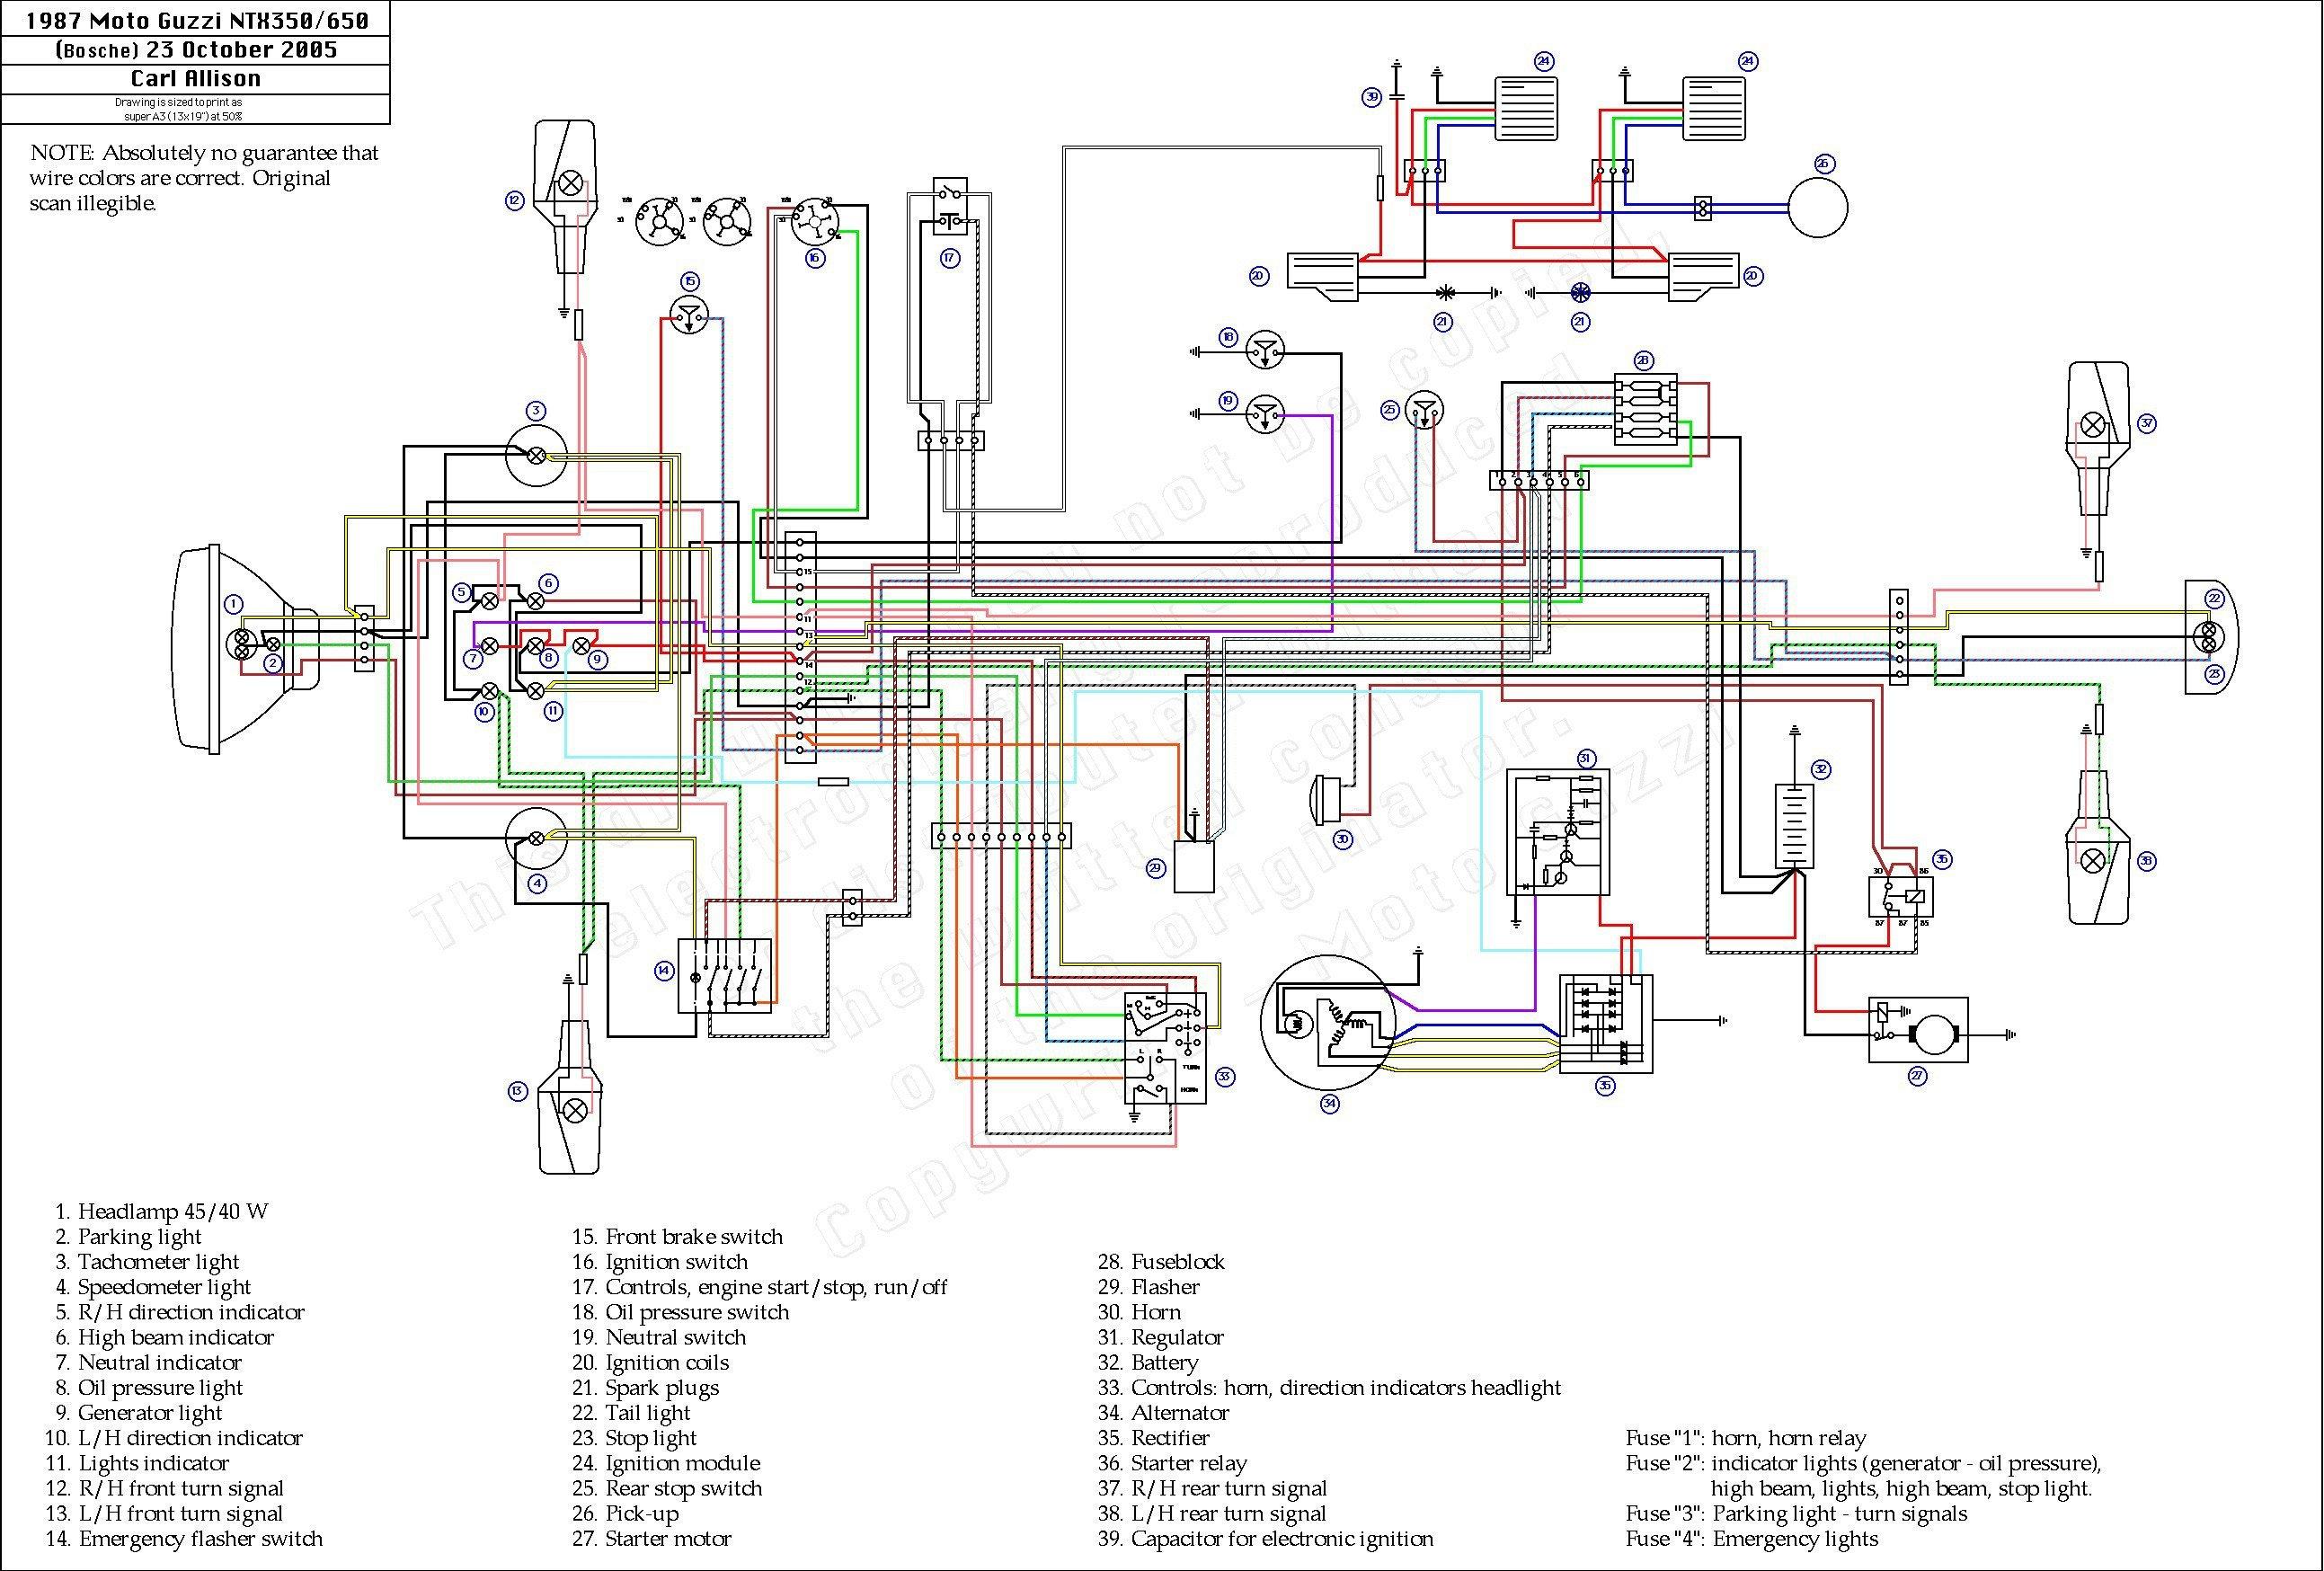 Ata110 B Wiring Diagram - New Era Of Wiring Diagram • - Taotao 110Cc Atv Wiring Diagram